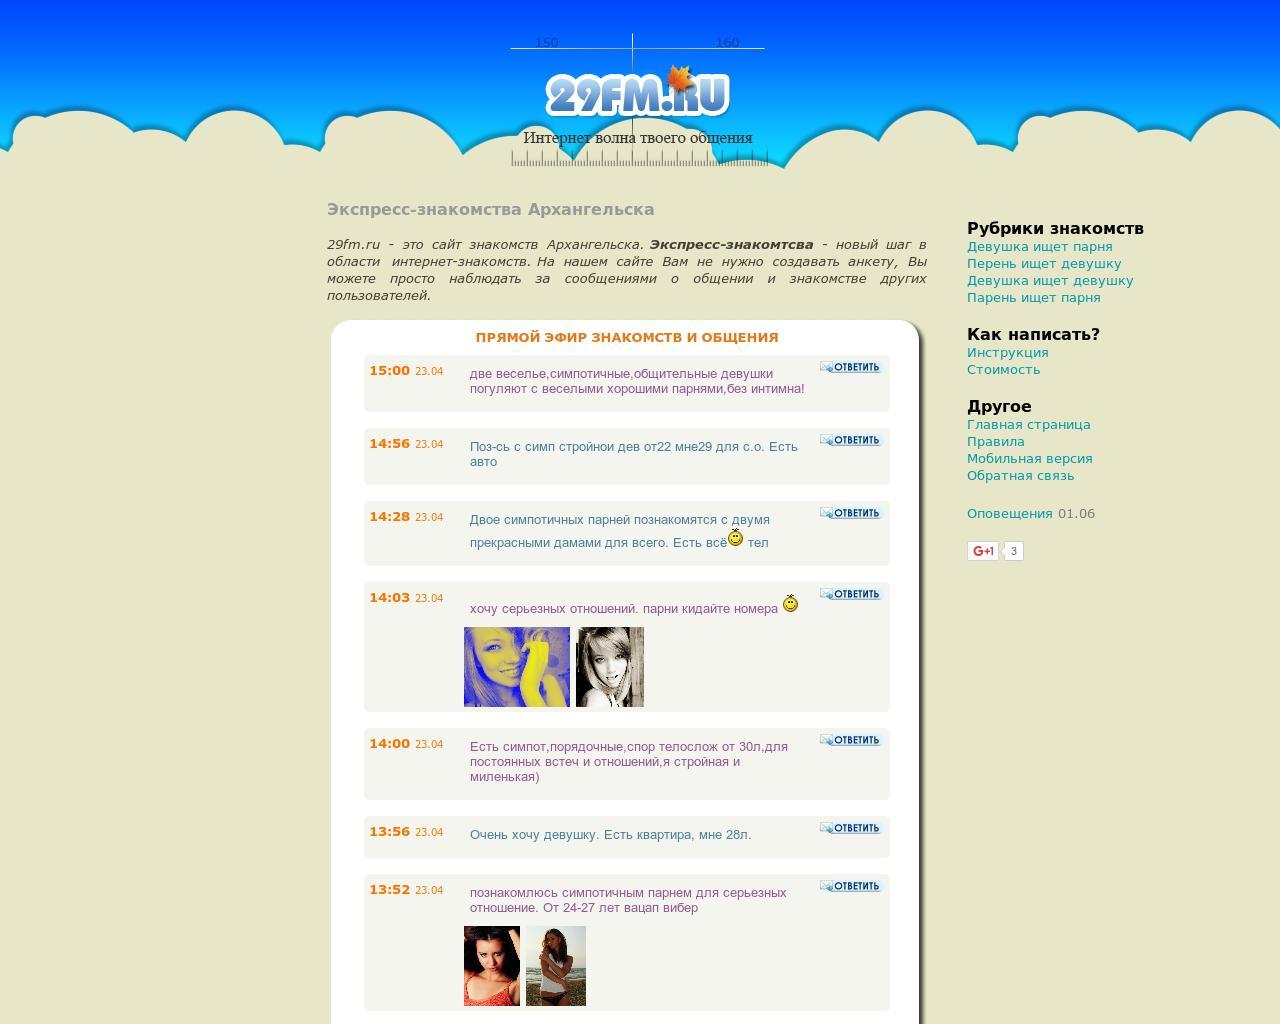 Дуслар сайт знакомств отзывы